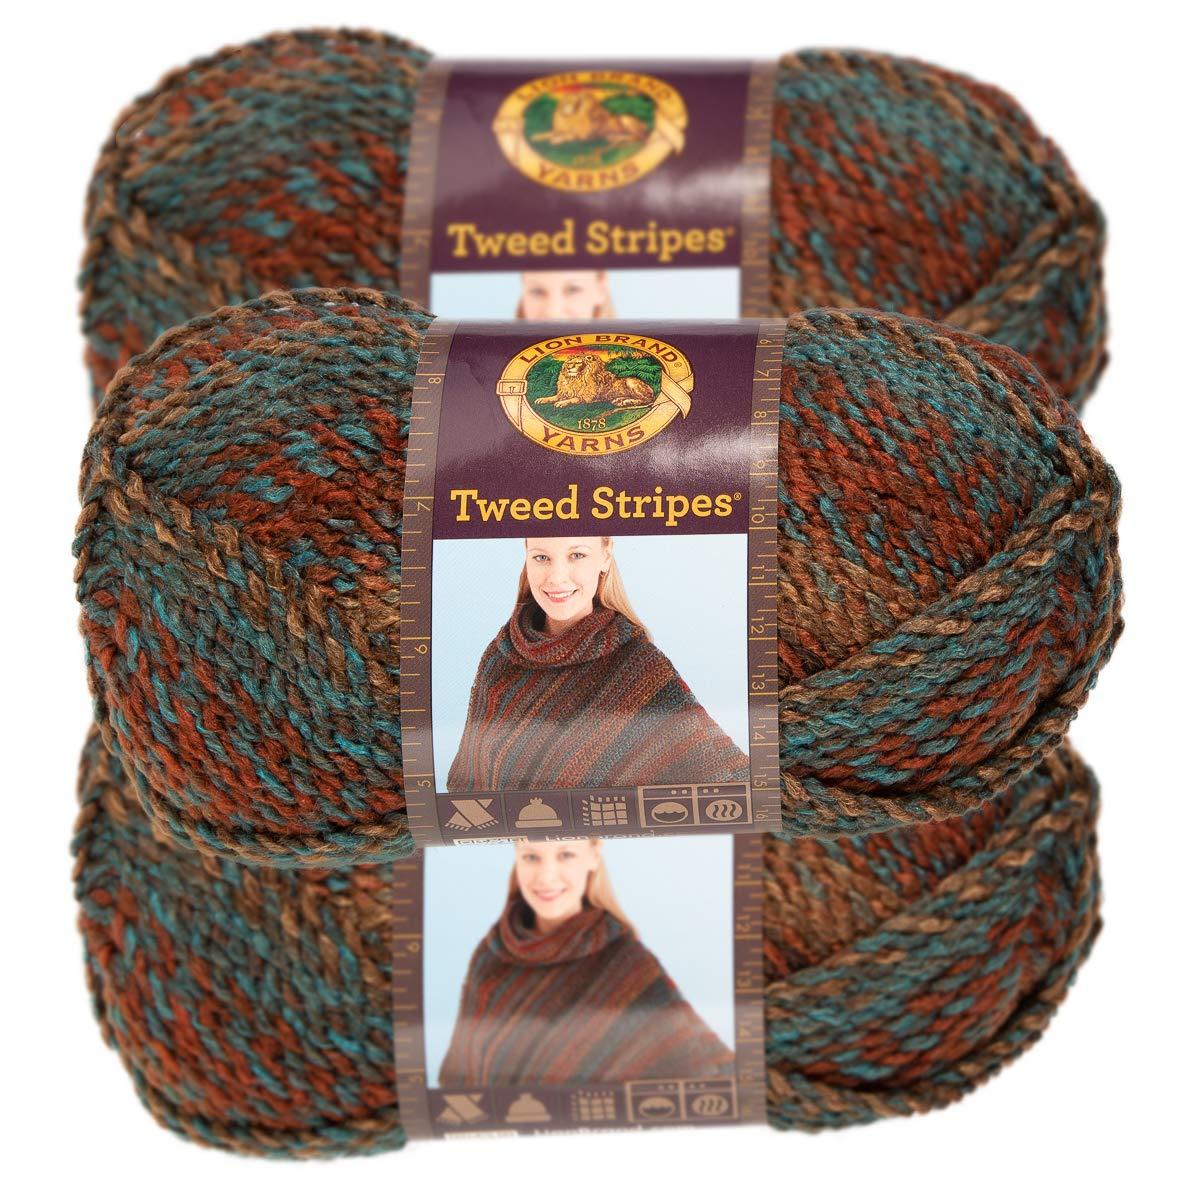 Chunky Yarn Acrylic 100 Percent Soft Yarn for Knitting Crocheting Bulky #5 3 Pack Lion Brand Yarn